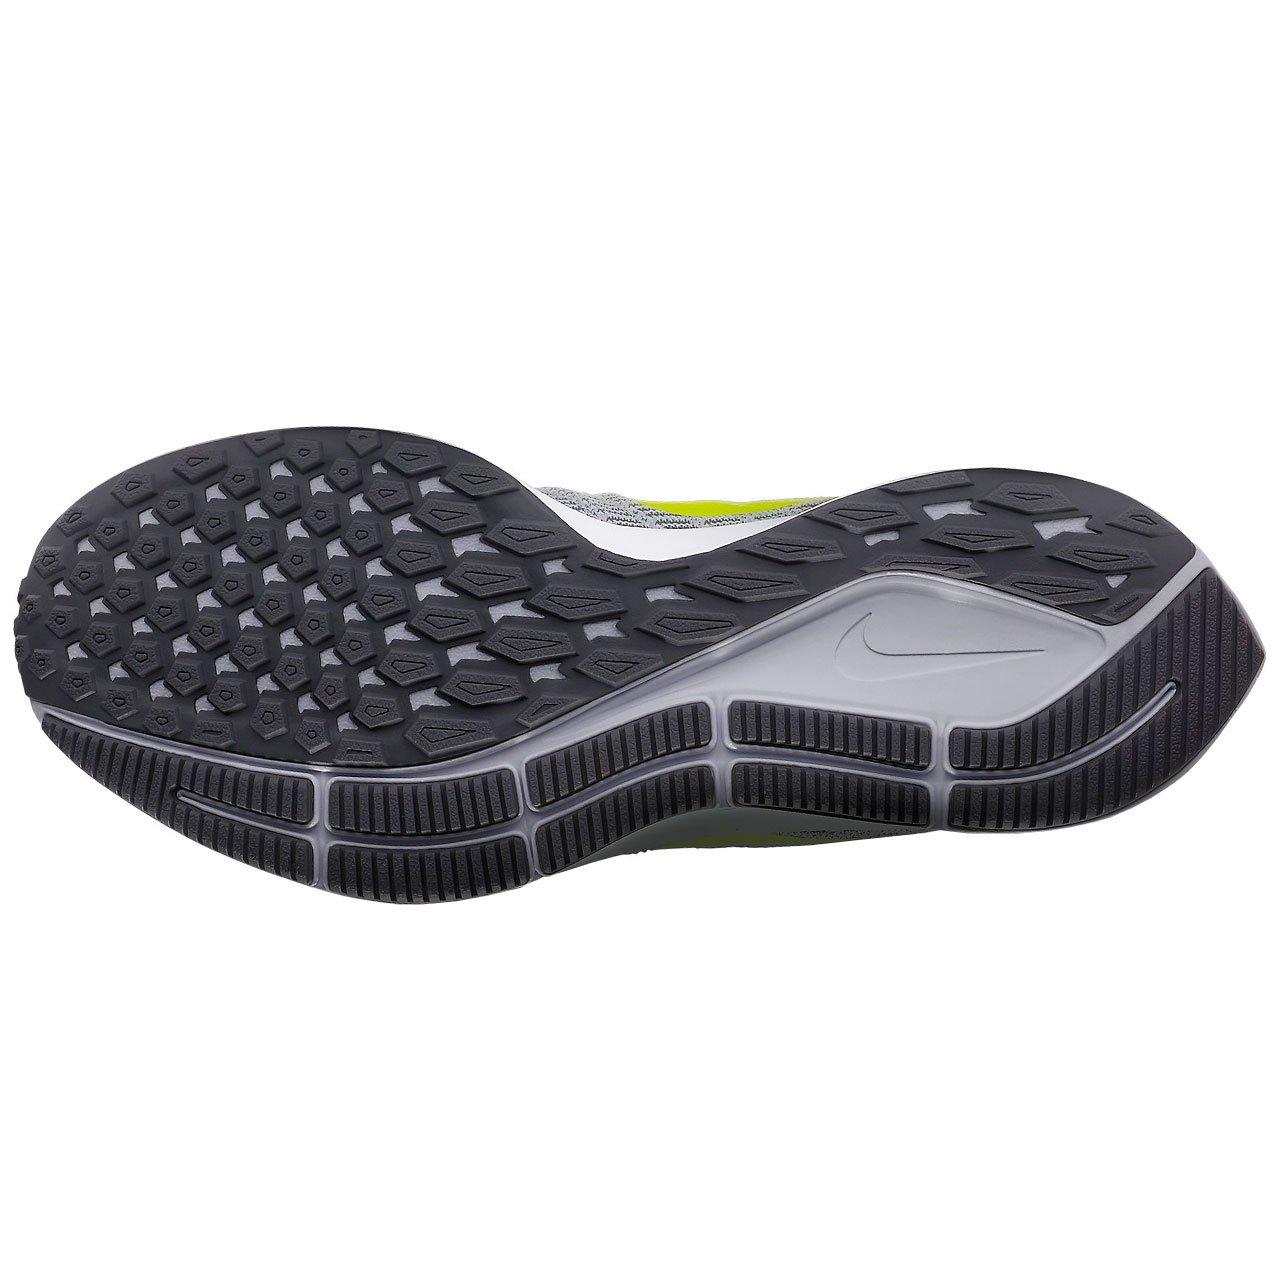 Nike Womens Air Zoom Pegasus 6.5 35 Running Shoes B079ZL9K8S 6.5 Pegasus B(M) US|White/Volt-gunsmoke-atmosphere Grey f49256